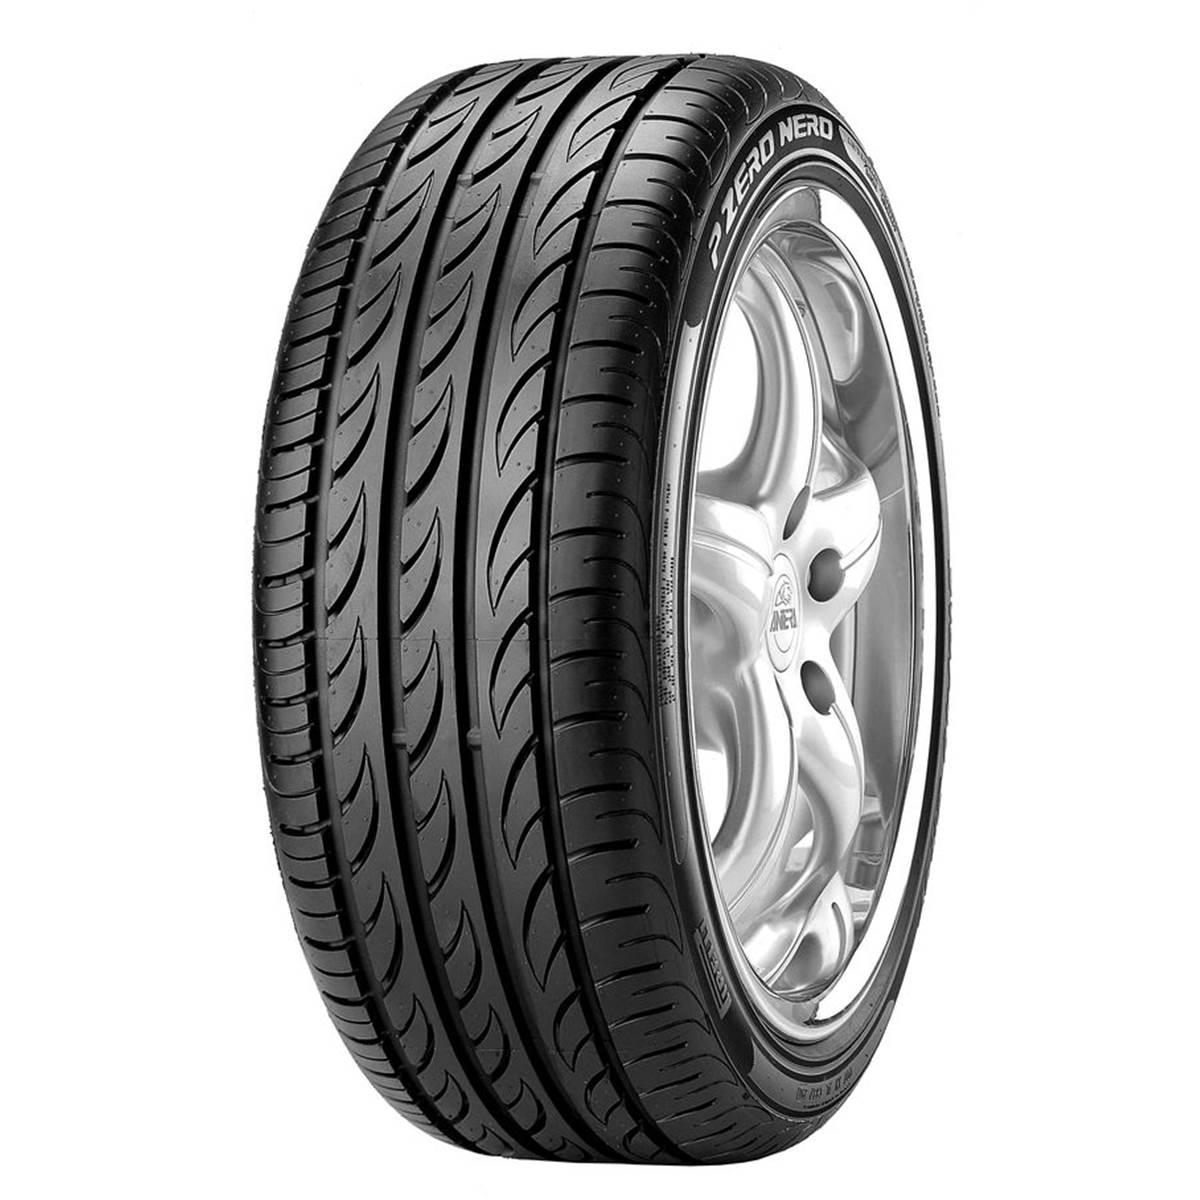 Pneu Pirelli 215/40R18 89W Pzero Nero XL